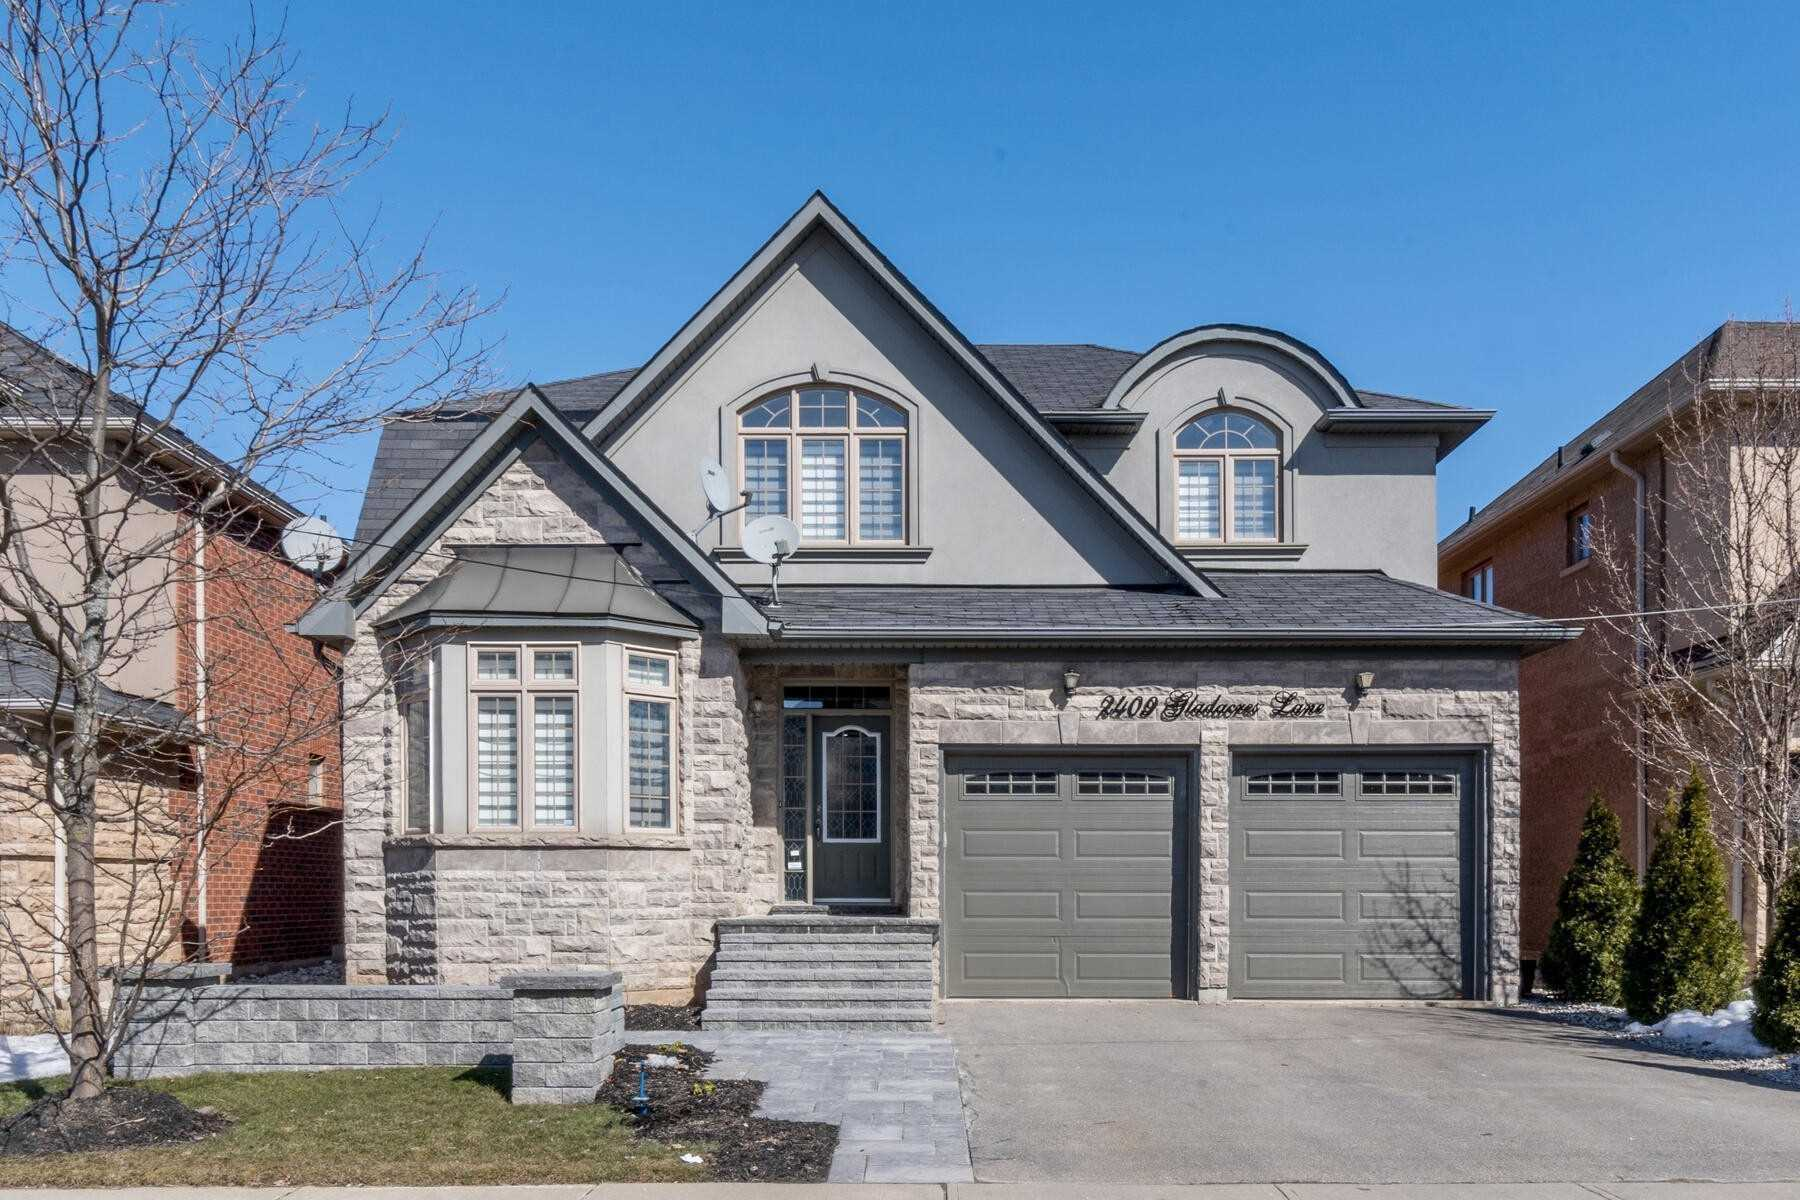 Detached house For Lease In Oakville - 2409 Gladacres Lane, Oakville, Ontario, Canada L6M 0G4 , 4 Bedrooms Bedrooms, ,5 BathroomsBathrooms,Detached,For Lease,Gladacres